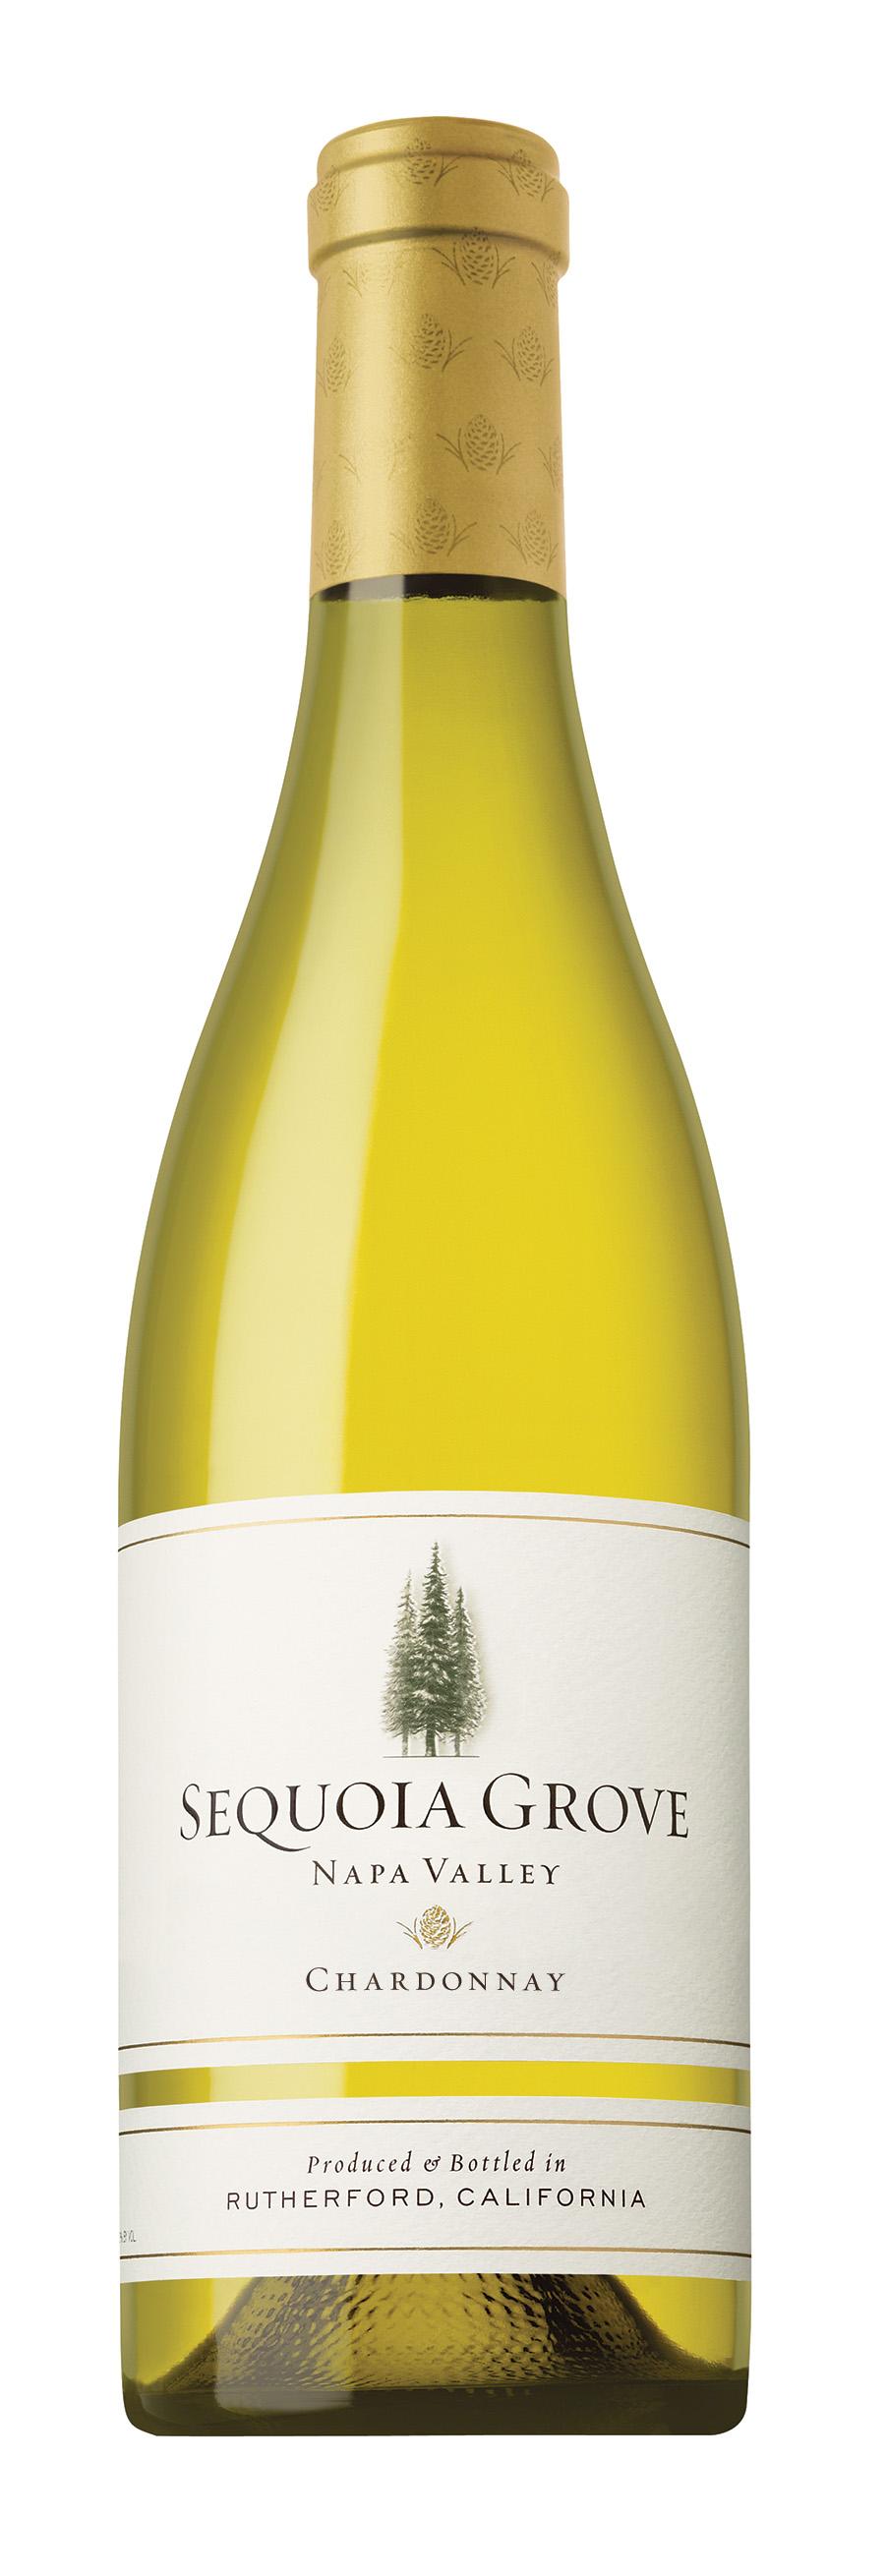 2013 Sequoia Grove Chardonnay Napa Valley